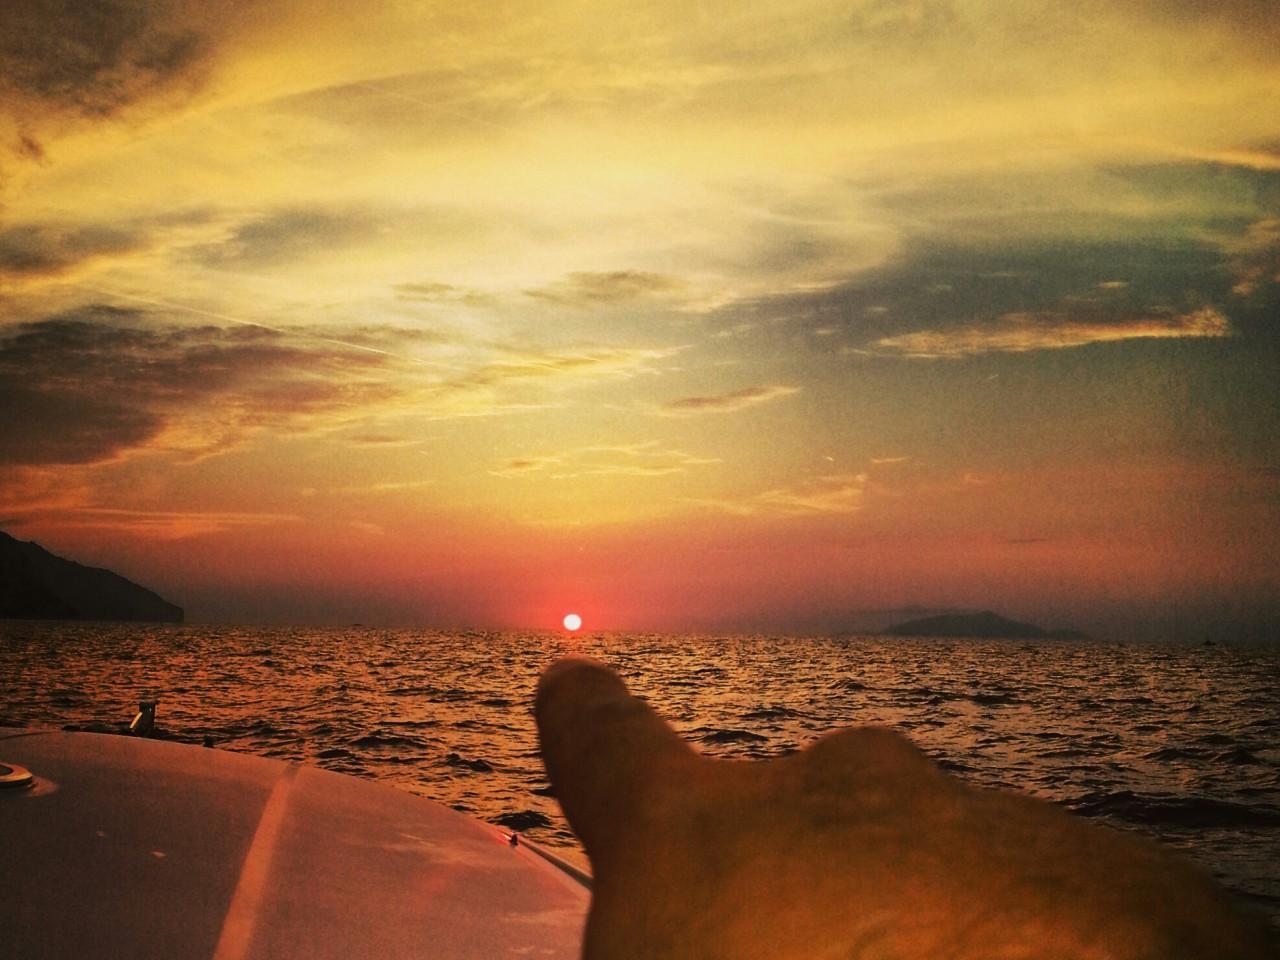 Booking tour boat in Capri